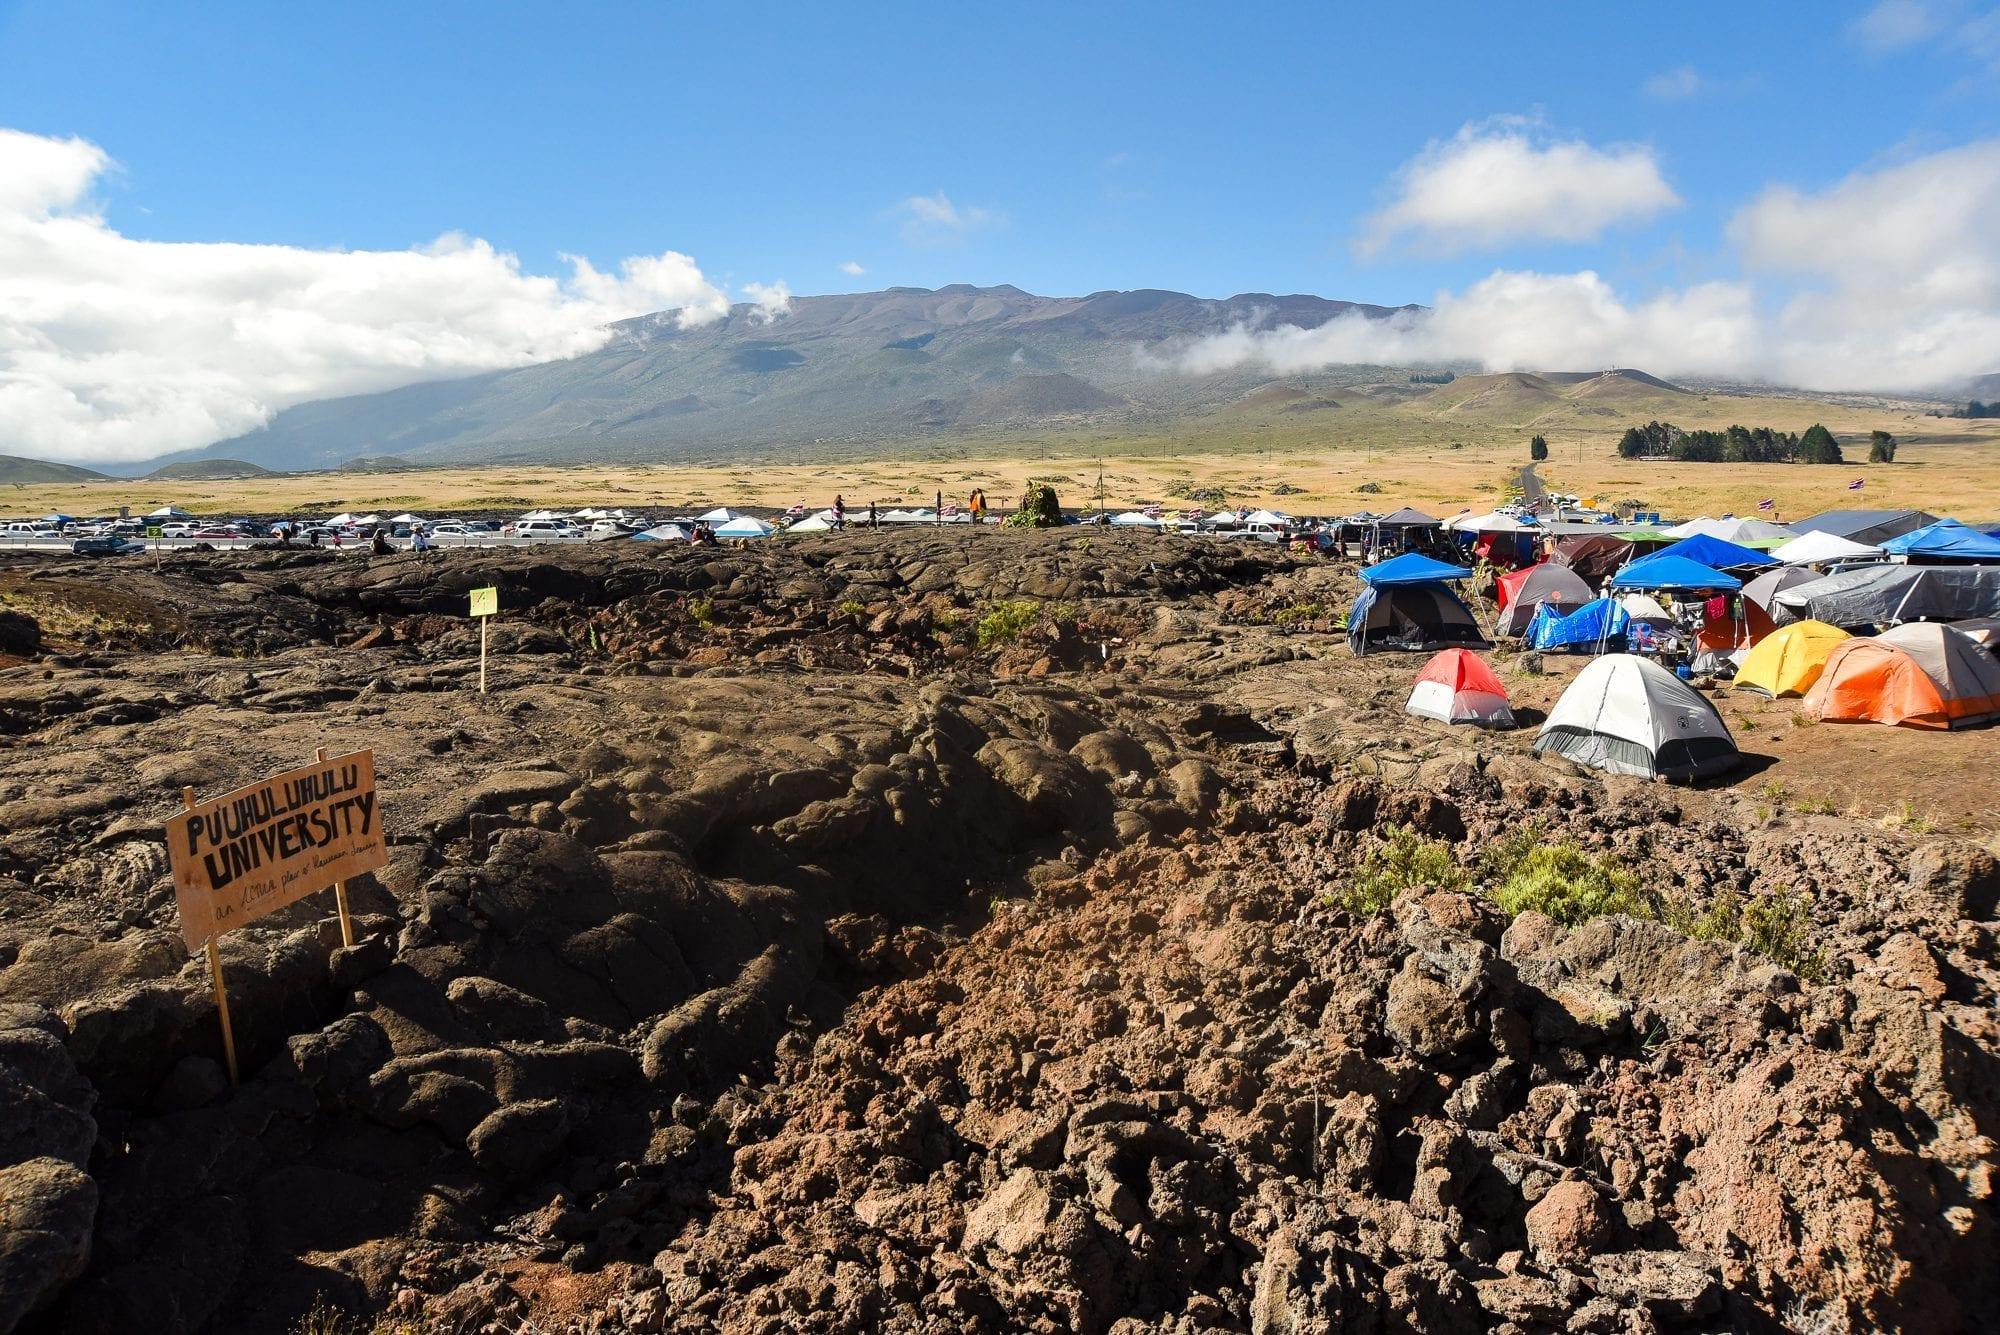 Mauna Kea being an ally to Hawaiians - image of Mauna Kea and the access road blocked